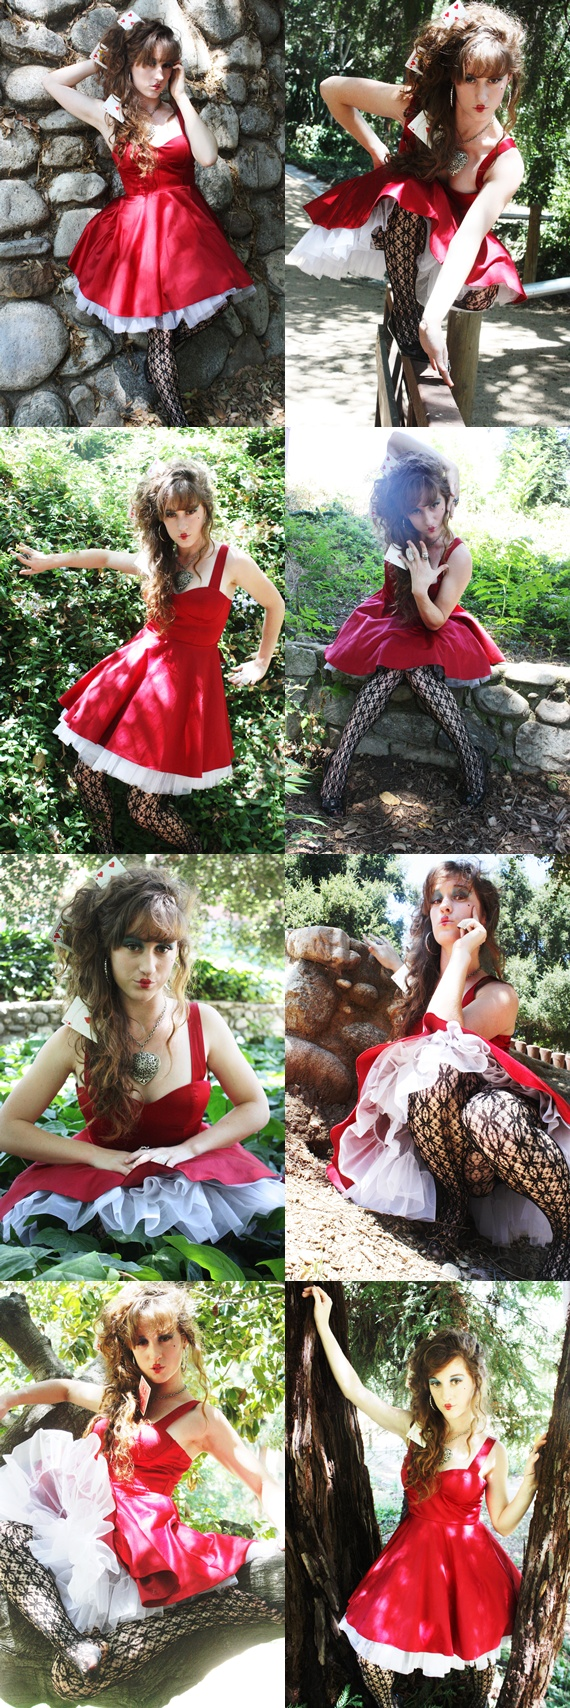 Alice and Wonderland Park Aug 05, 2010 Payton Trixx, Andrew Vasquez Queen of Hearts =Love (Edit by Trixx)